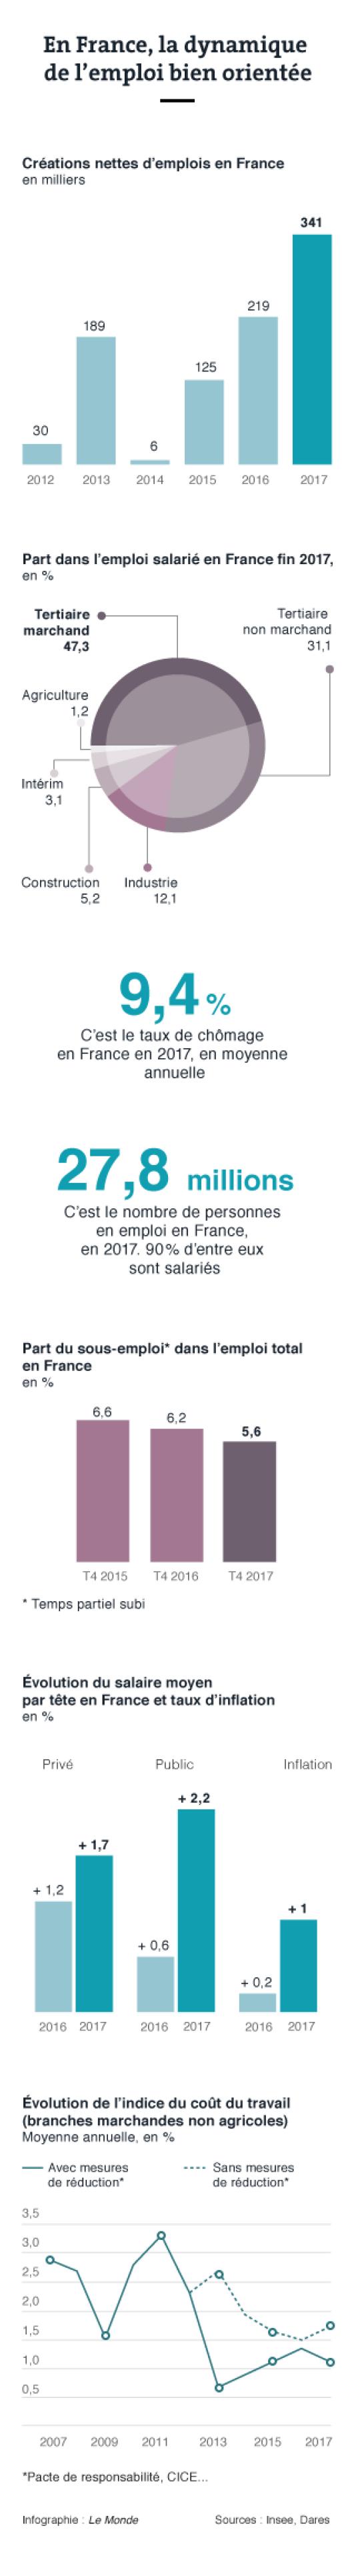 Tableau de bord de l'emploi en France en 2017